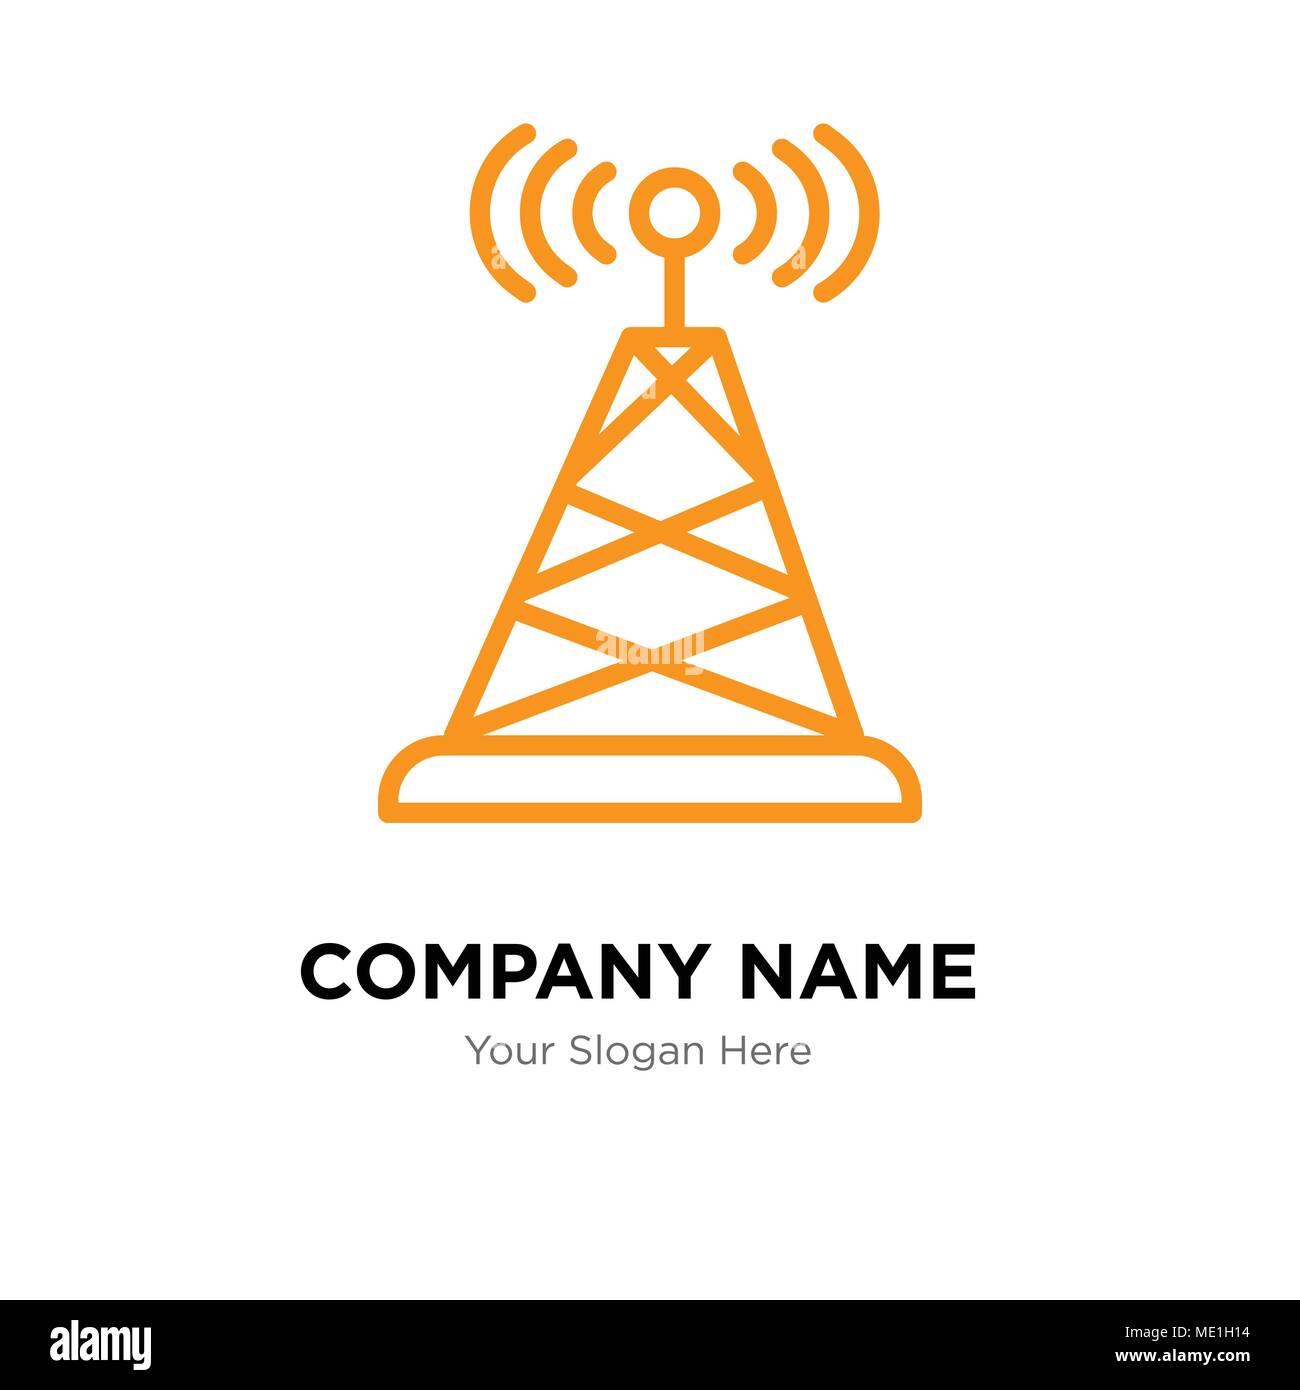 Antenna company logo design template, Business corporate vector icon - Stock Image